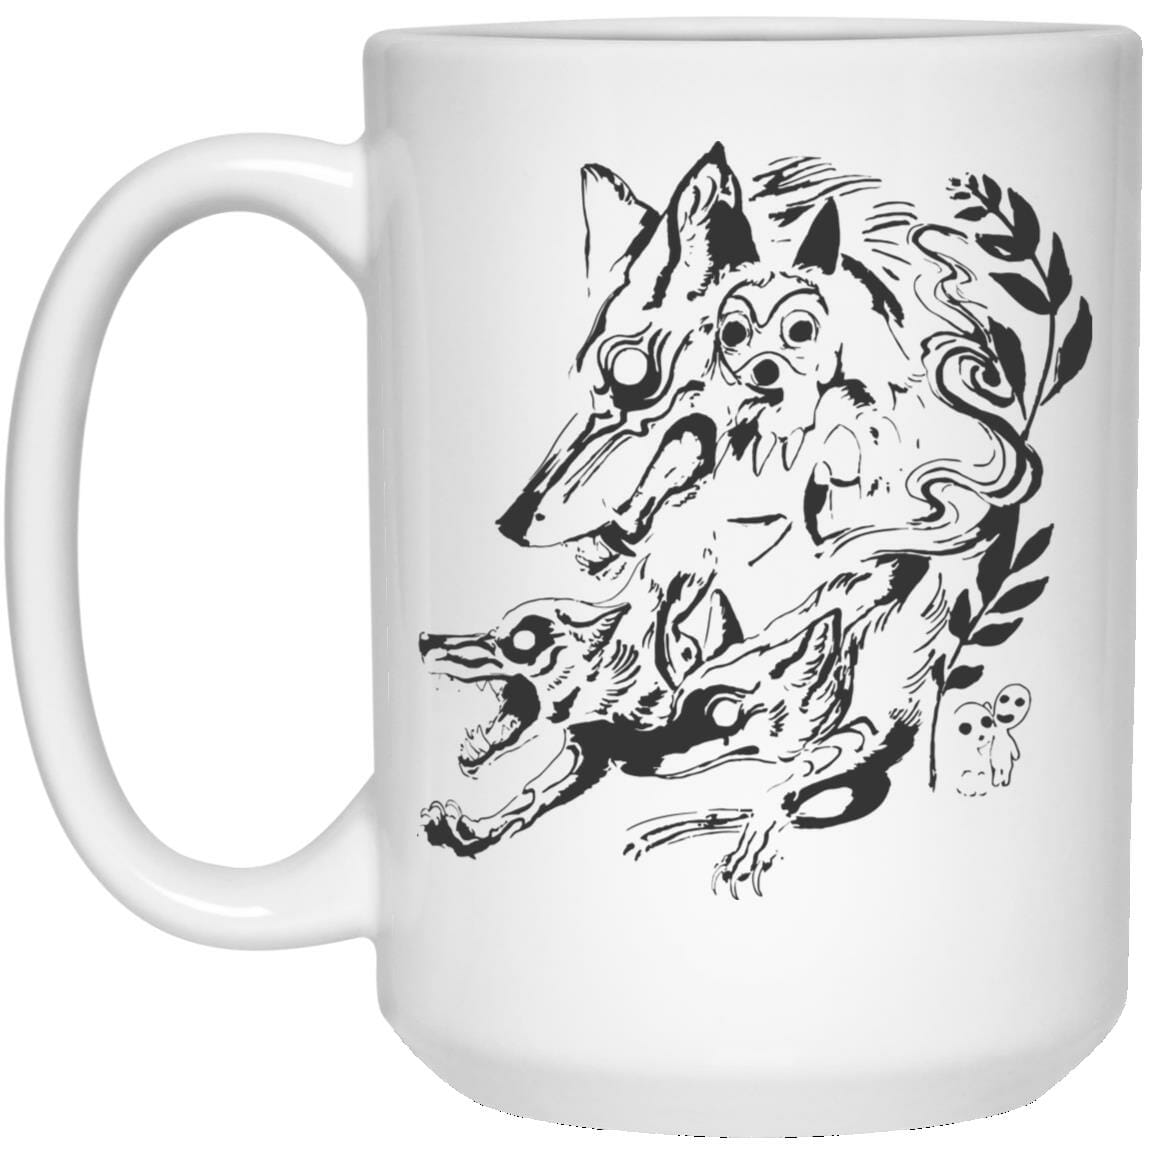 Princess Mononoke and The Wolf Creative Art Mug